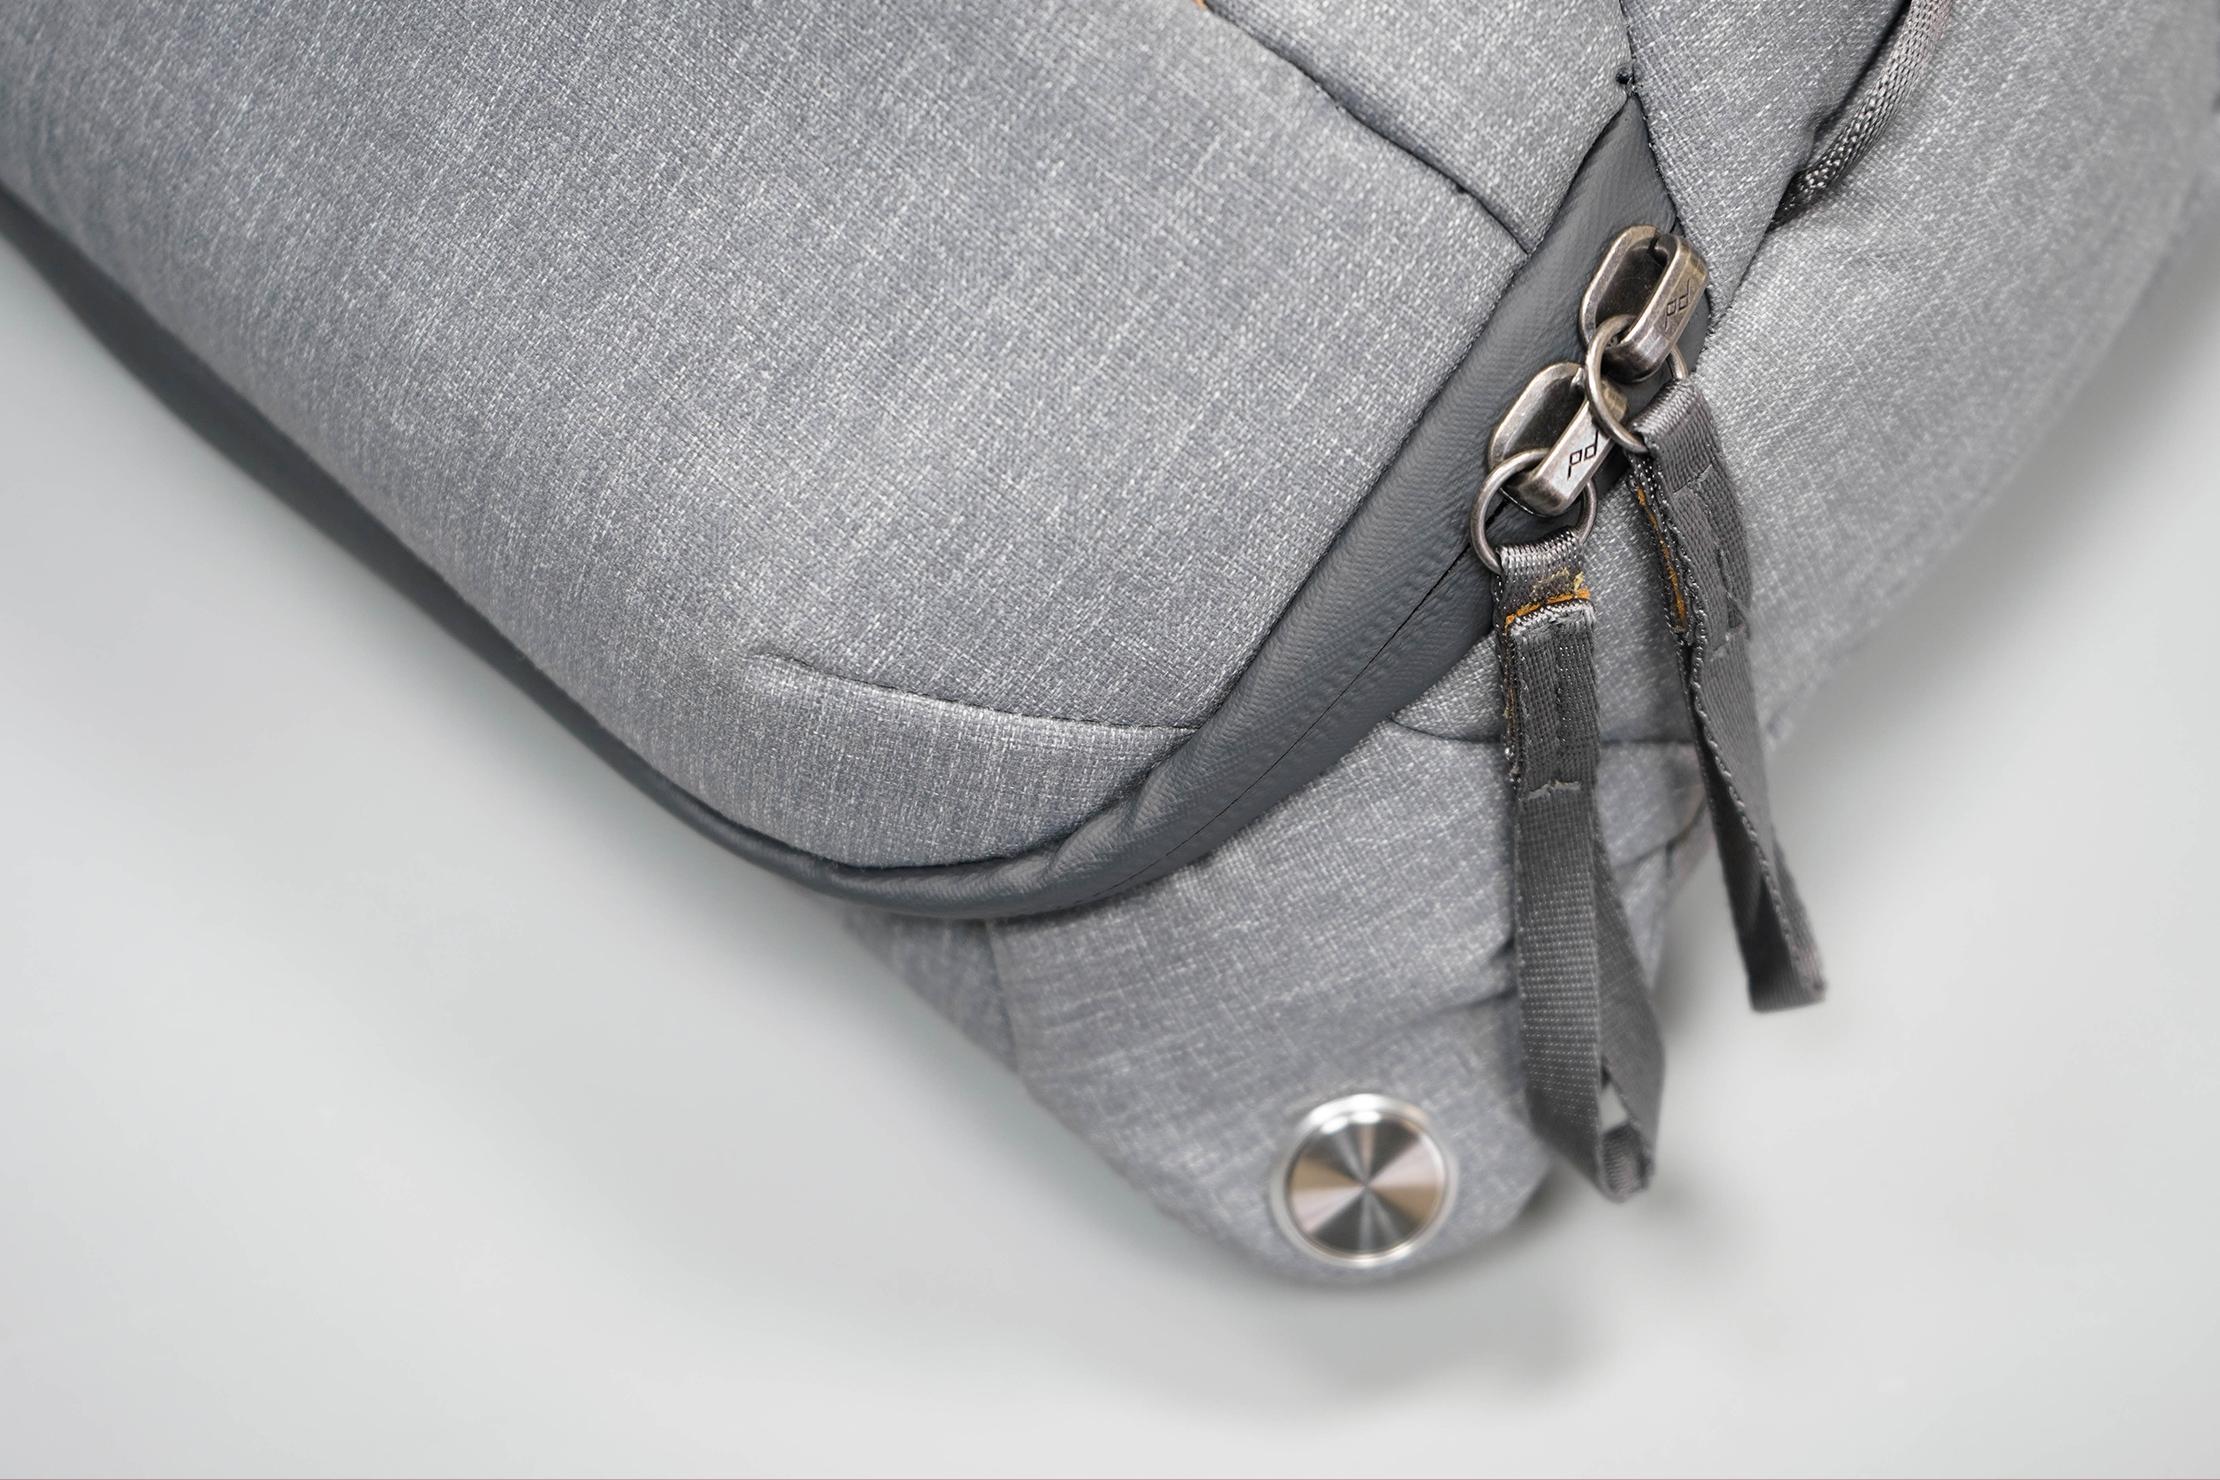 Peak Design Everyday Sling 10L V2 Zippers